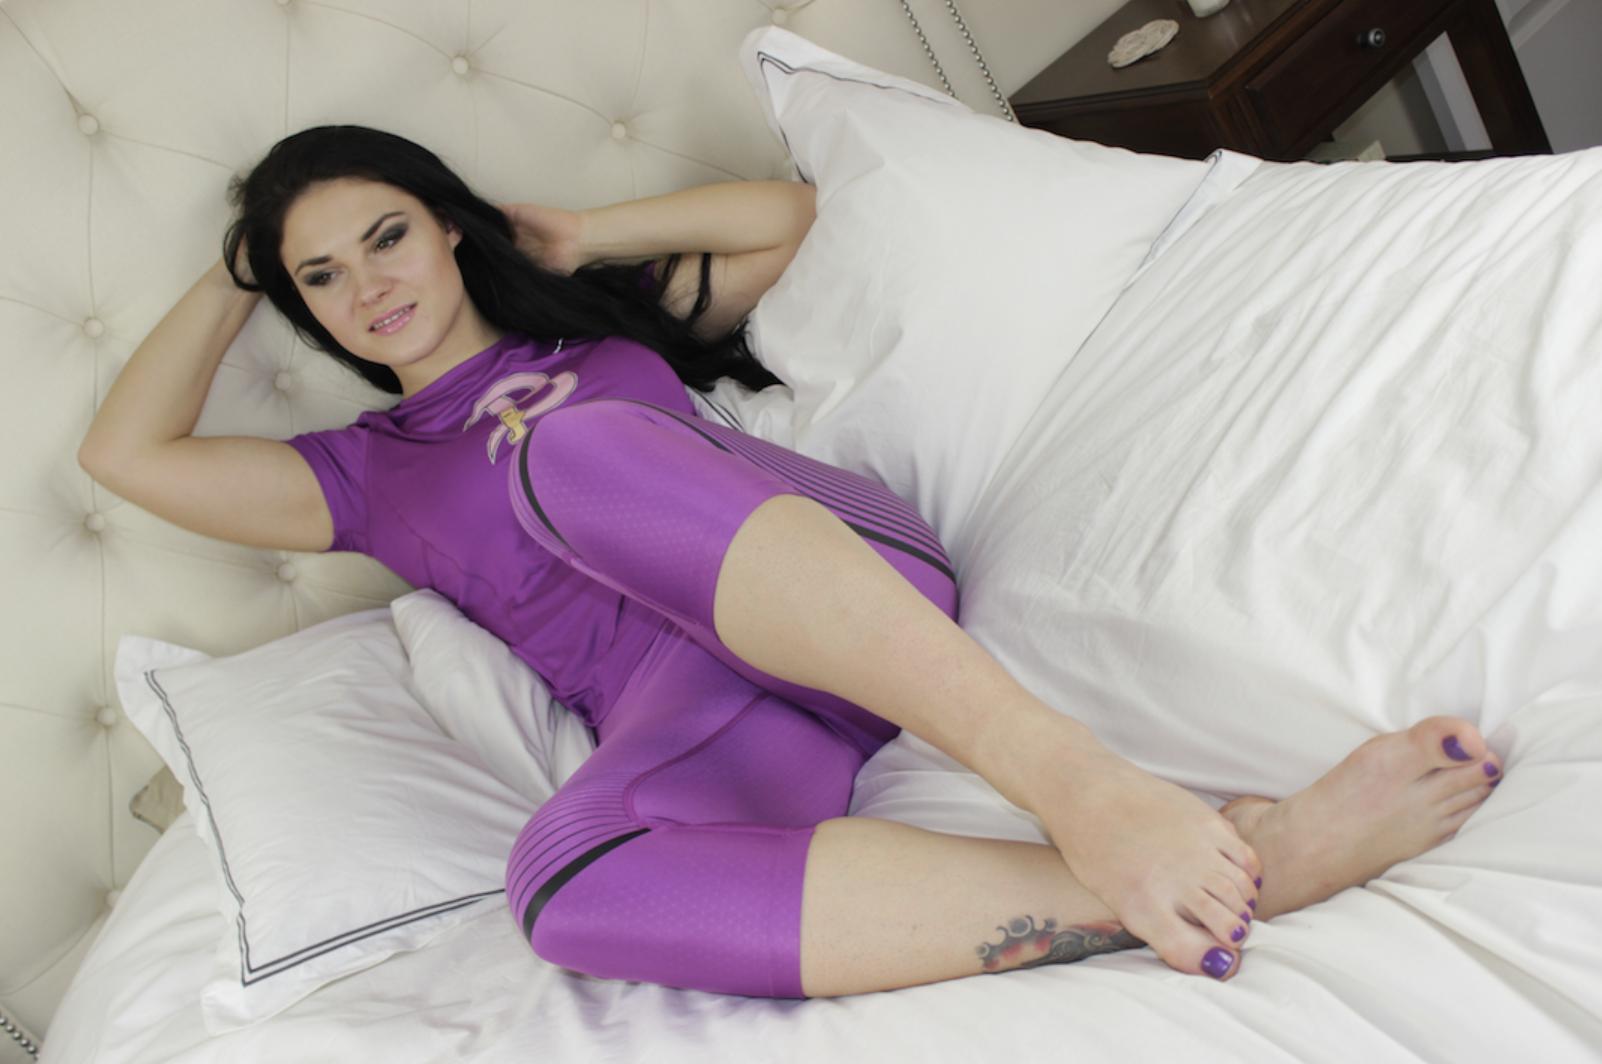 Katrina Von tease at beckysboutique nyc.png